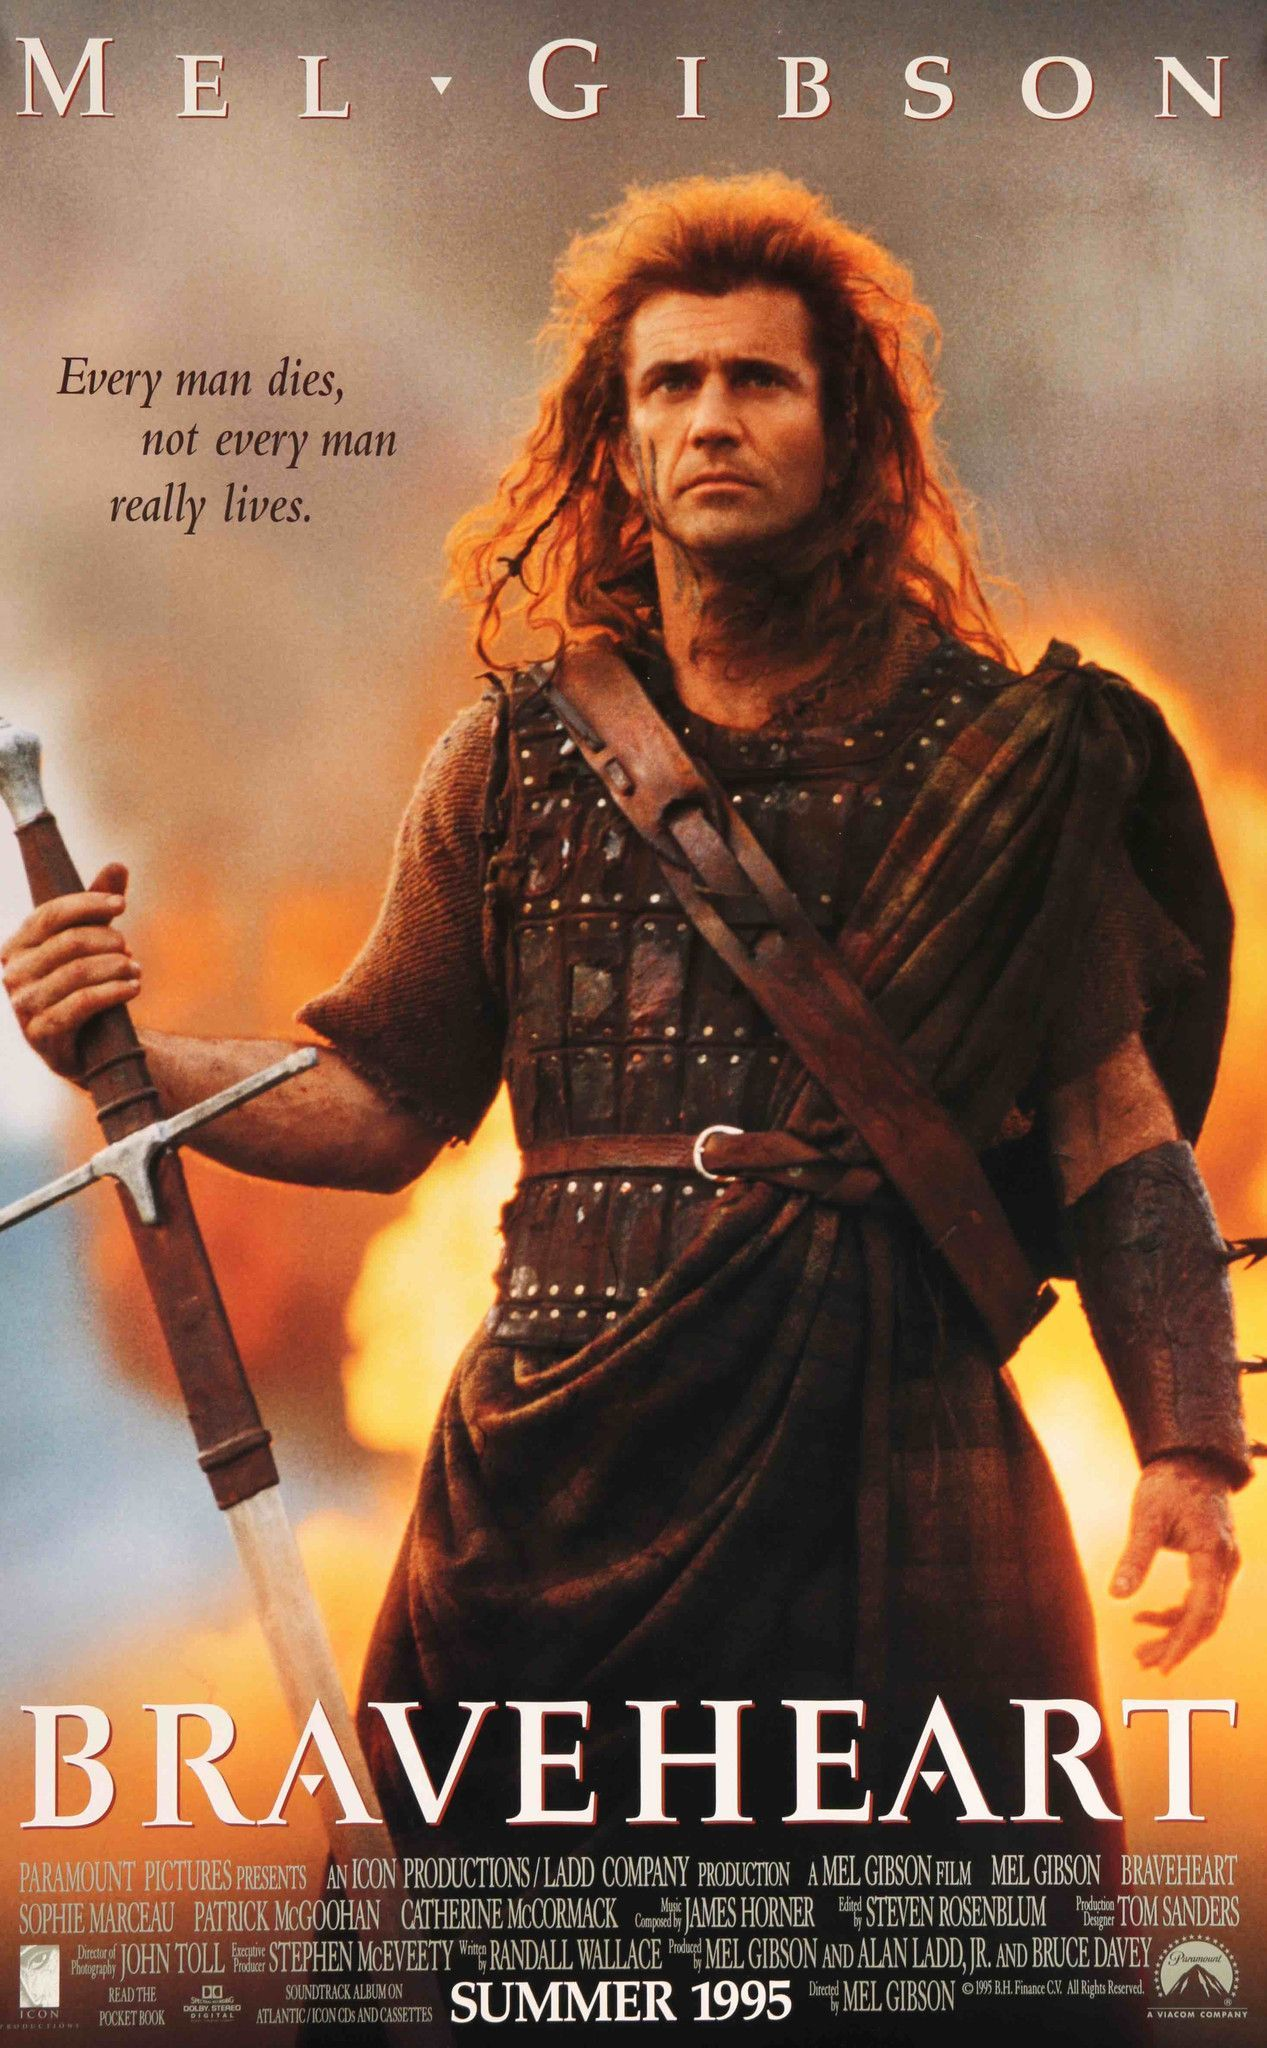 Braveheart (1995) Vintage Advance Movie Poster - 27\